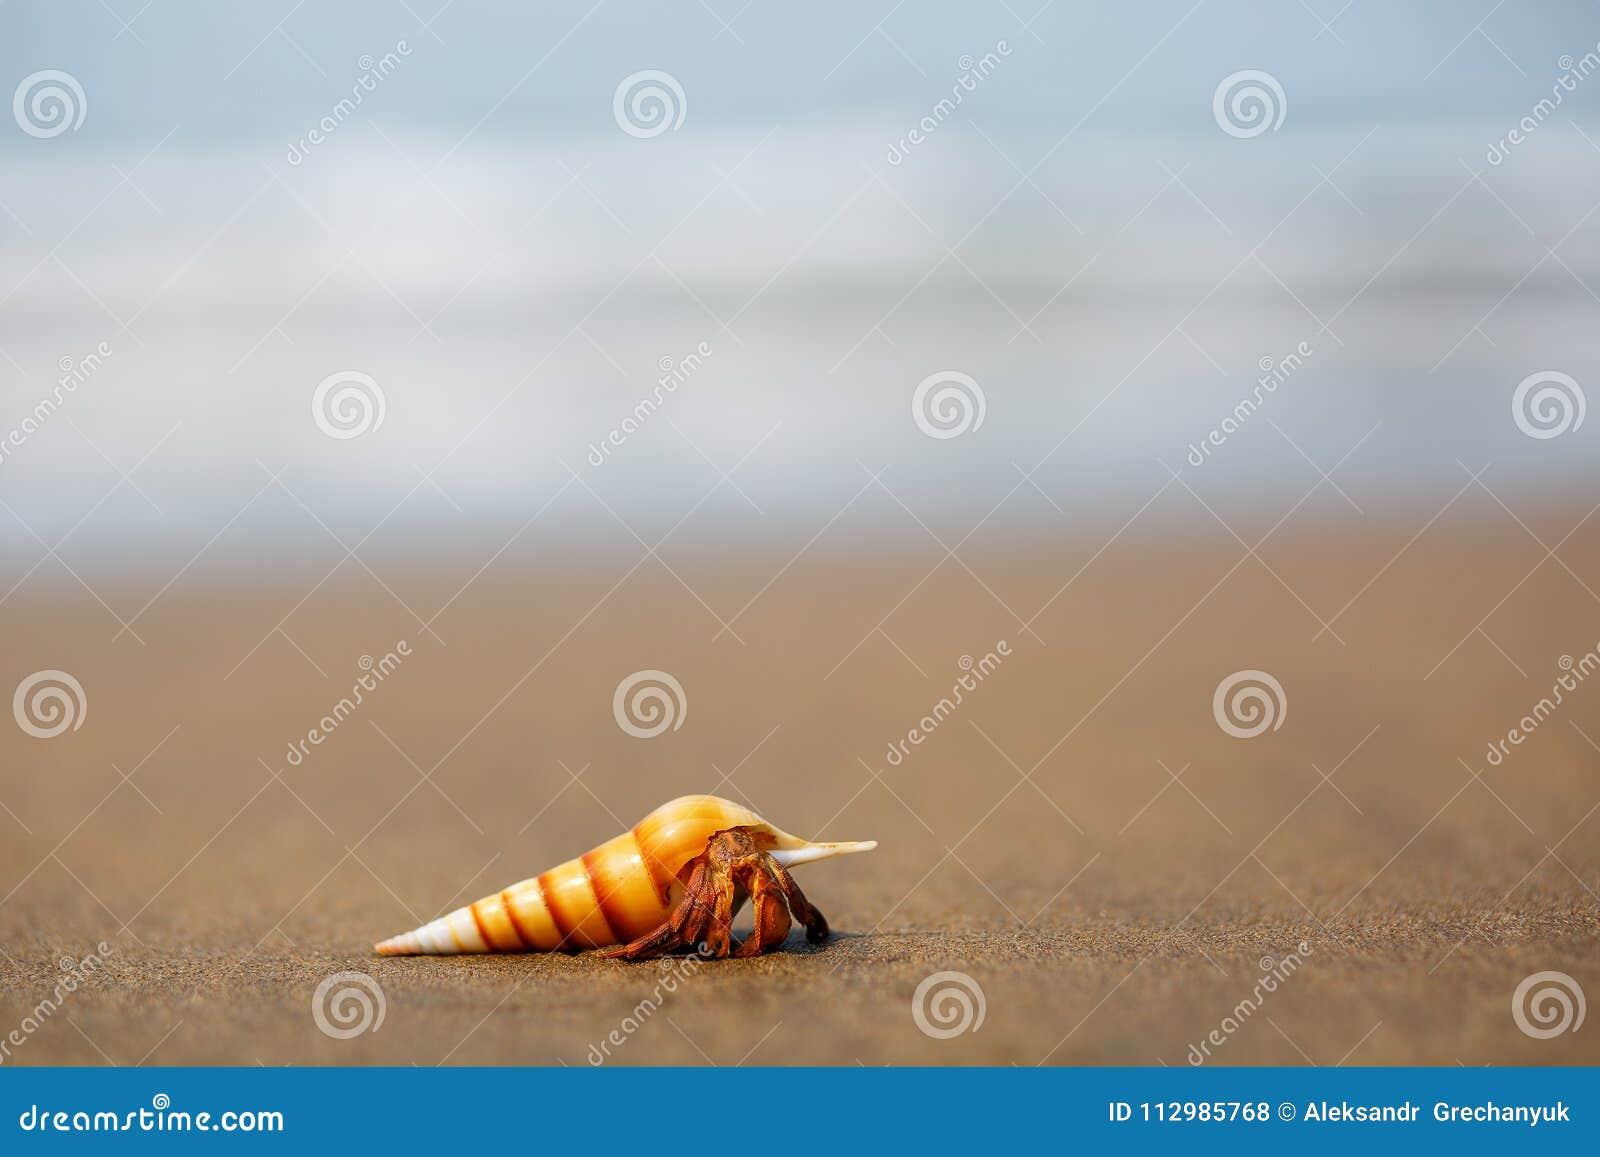 Hermit crab on the beach in Varkala